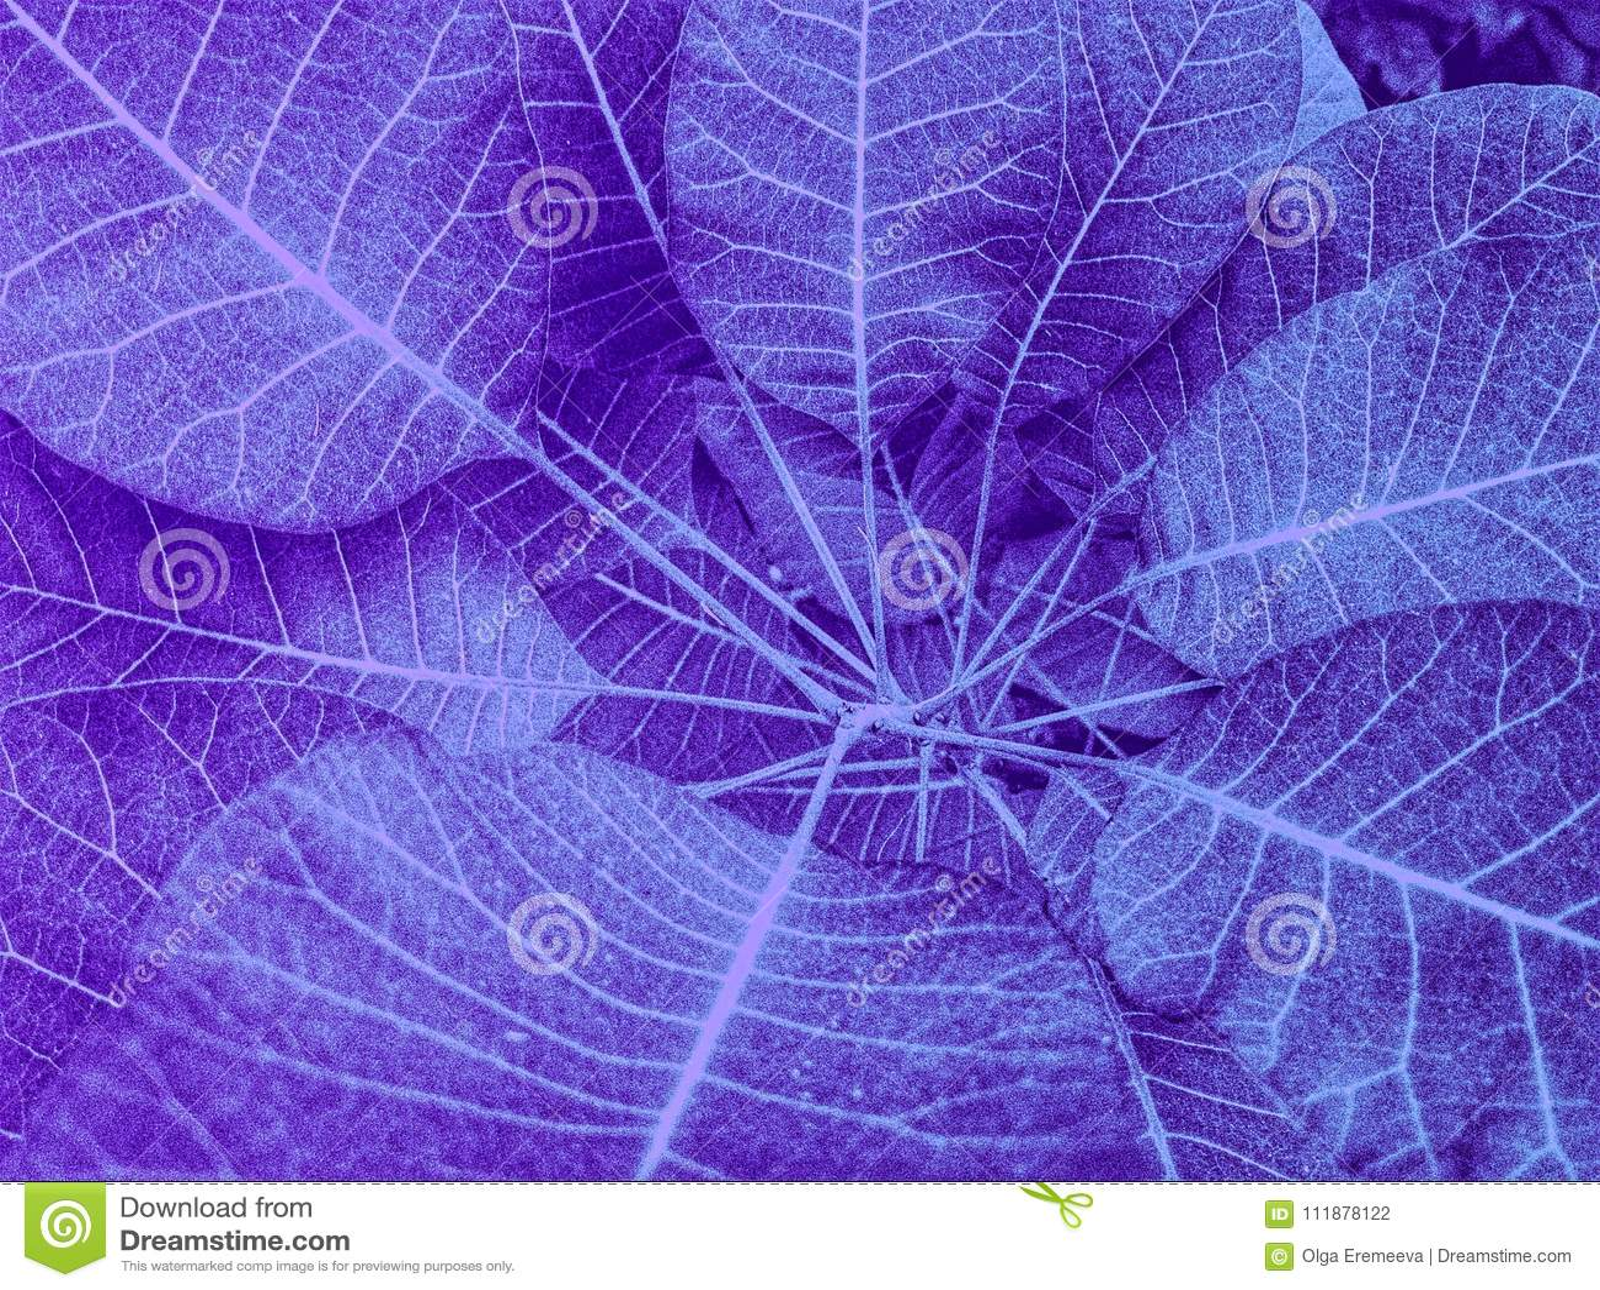 Ultra violet transparent leaves in closeup